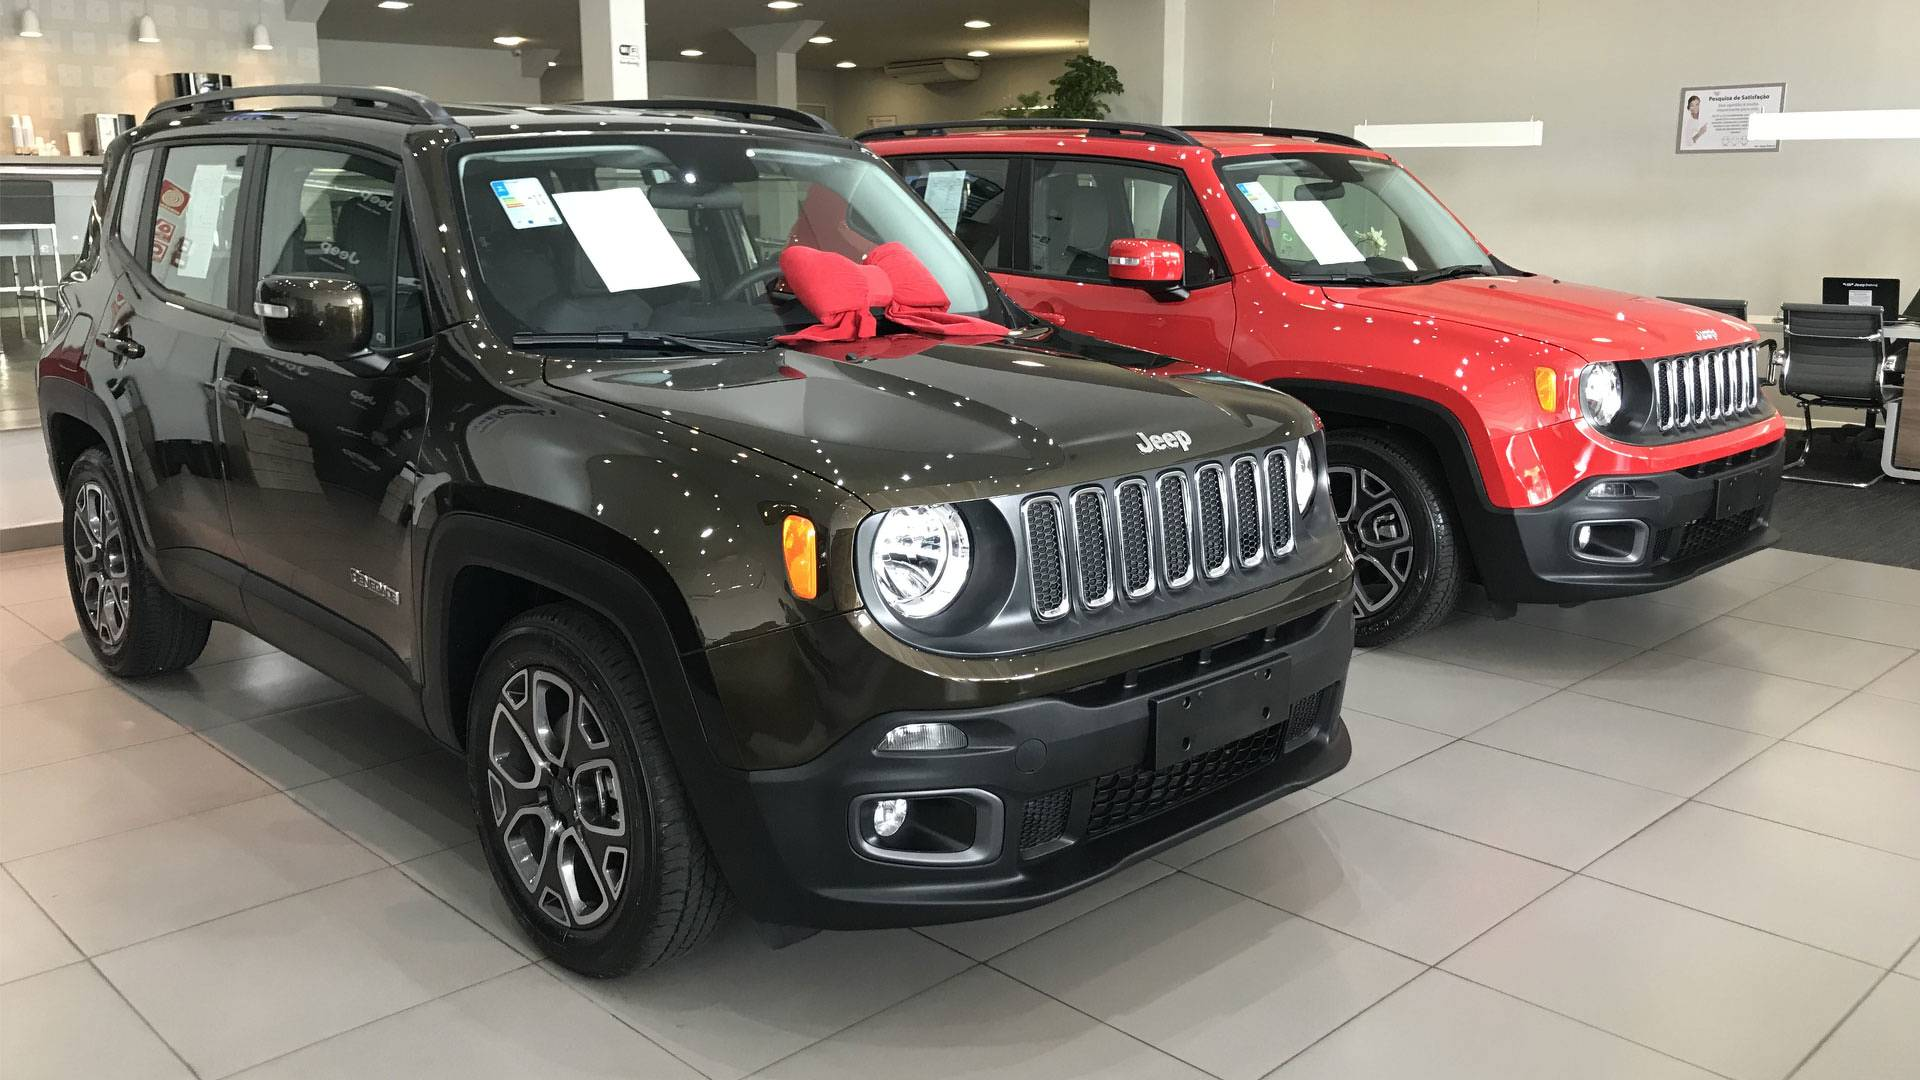 Jeep Renegade Tem Porta Malas Ampliado Para 320 Litros